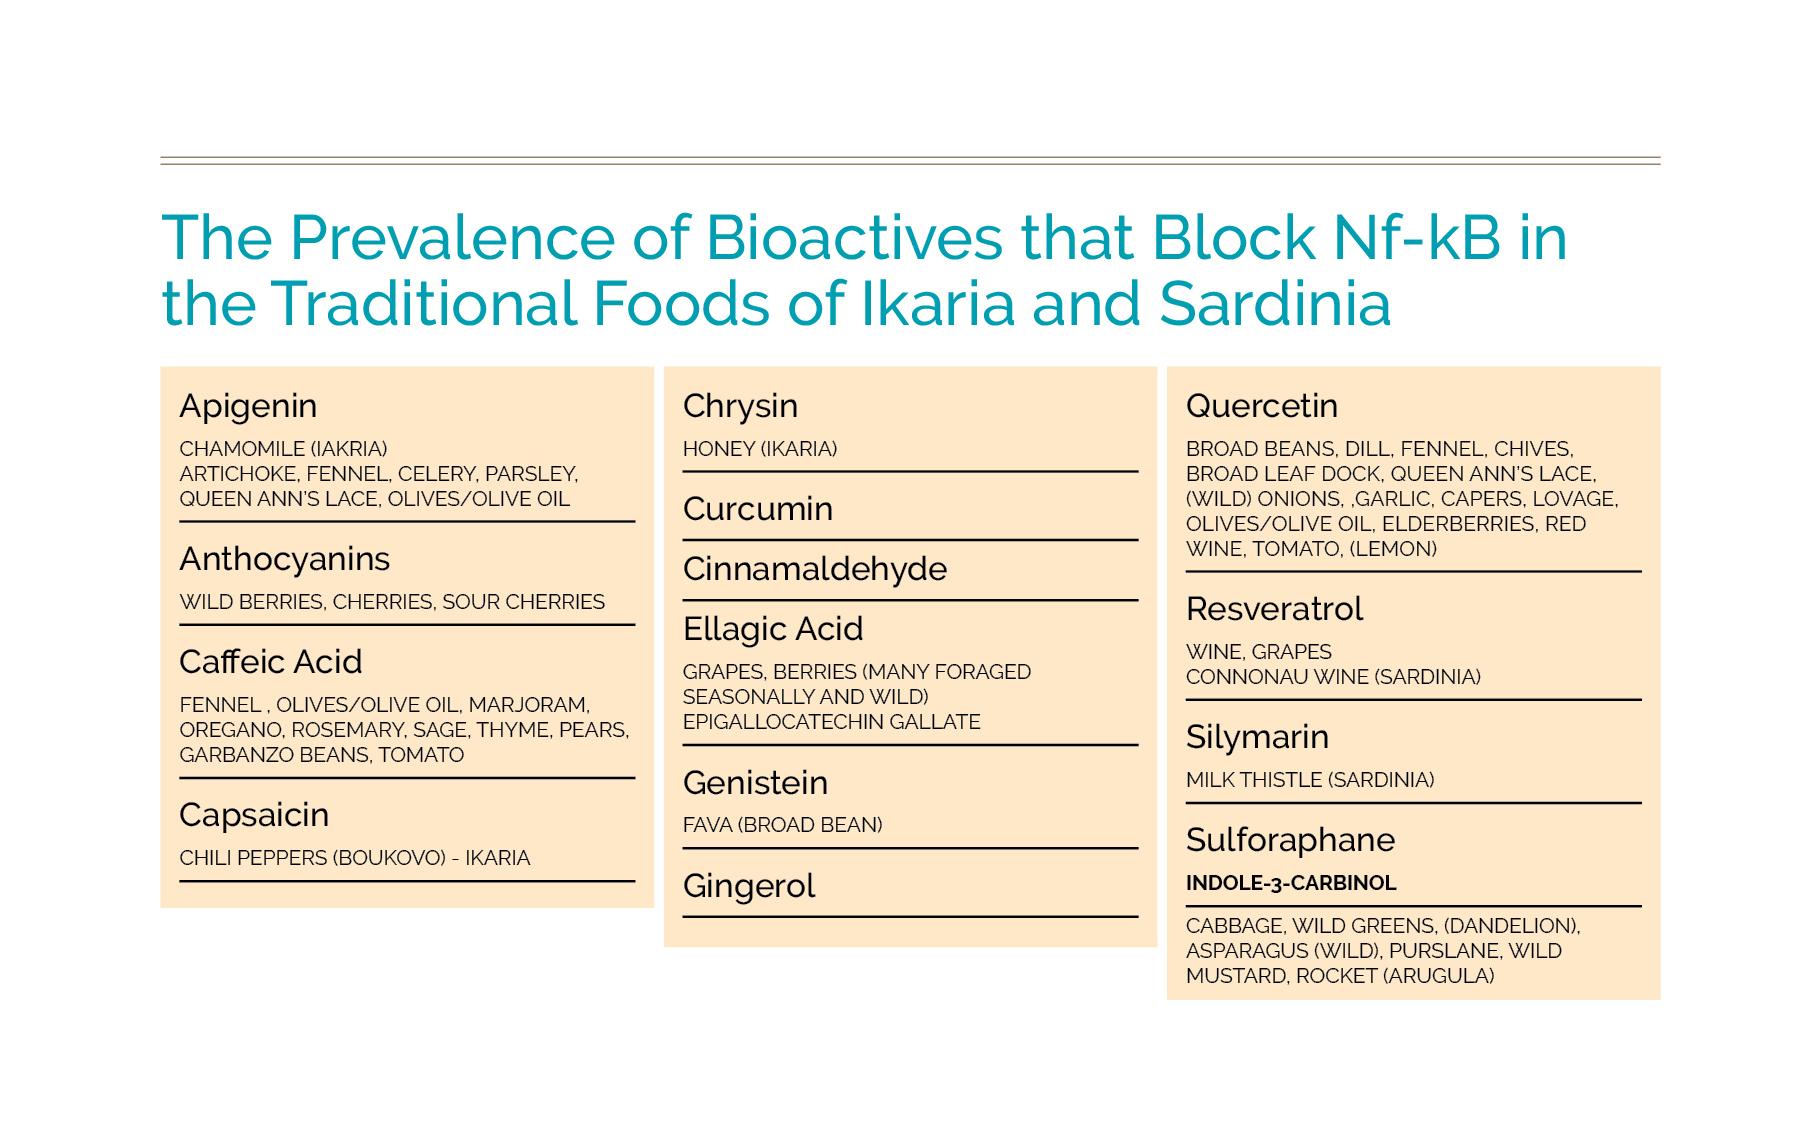 bioactives in foods of ikaria and sardinia.jpg